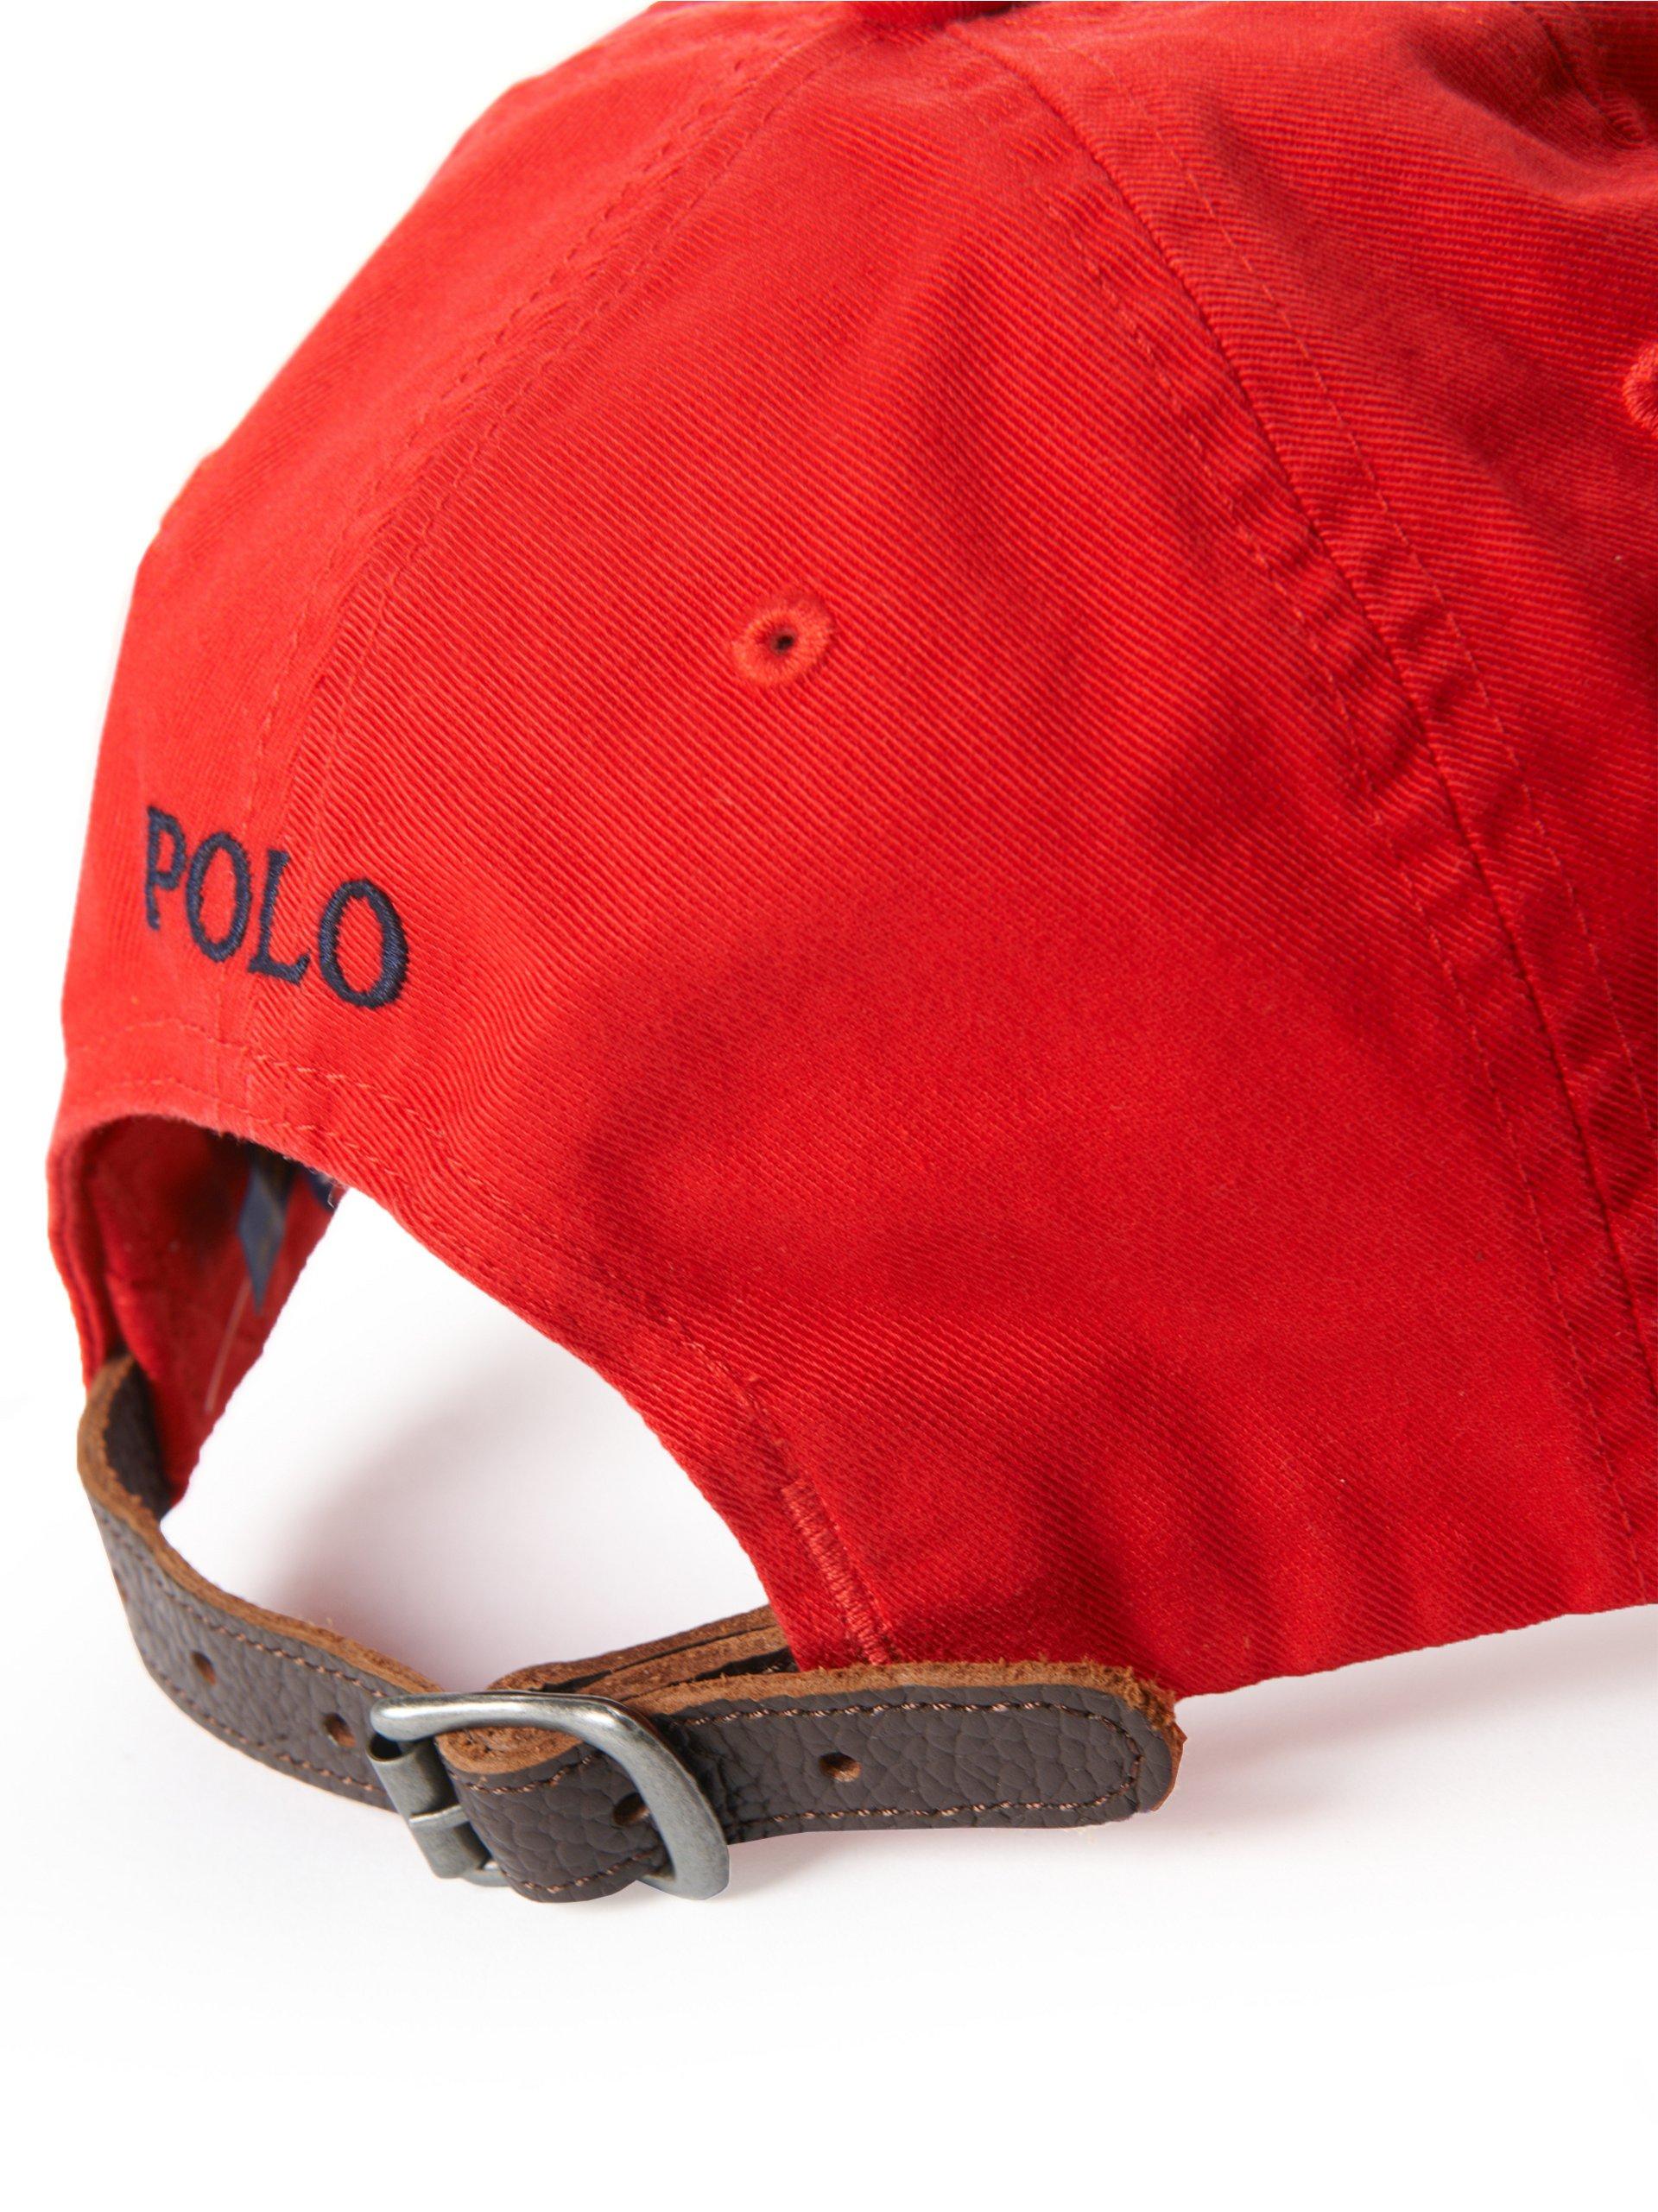 polo ralph lauren herren cap rot uni online kaufen peek und cloppenburg de. Black Bedroom Furniture Sets. Home Design Ideas